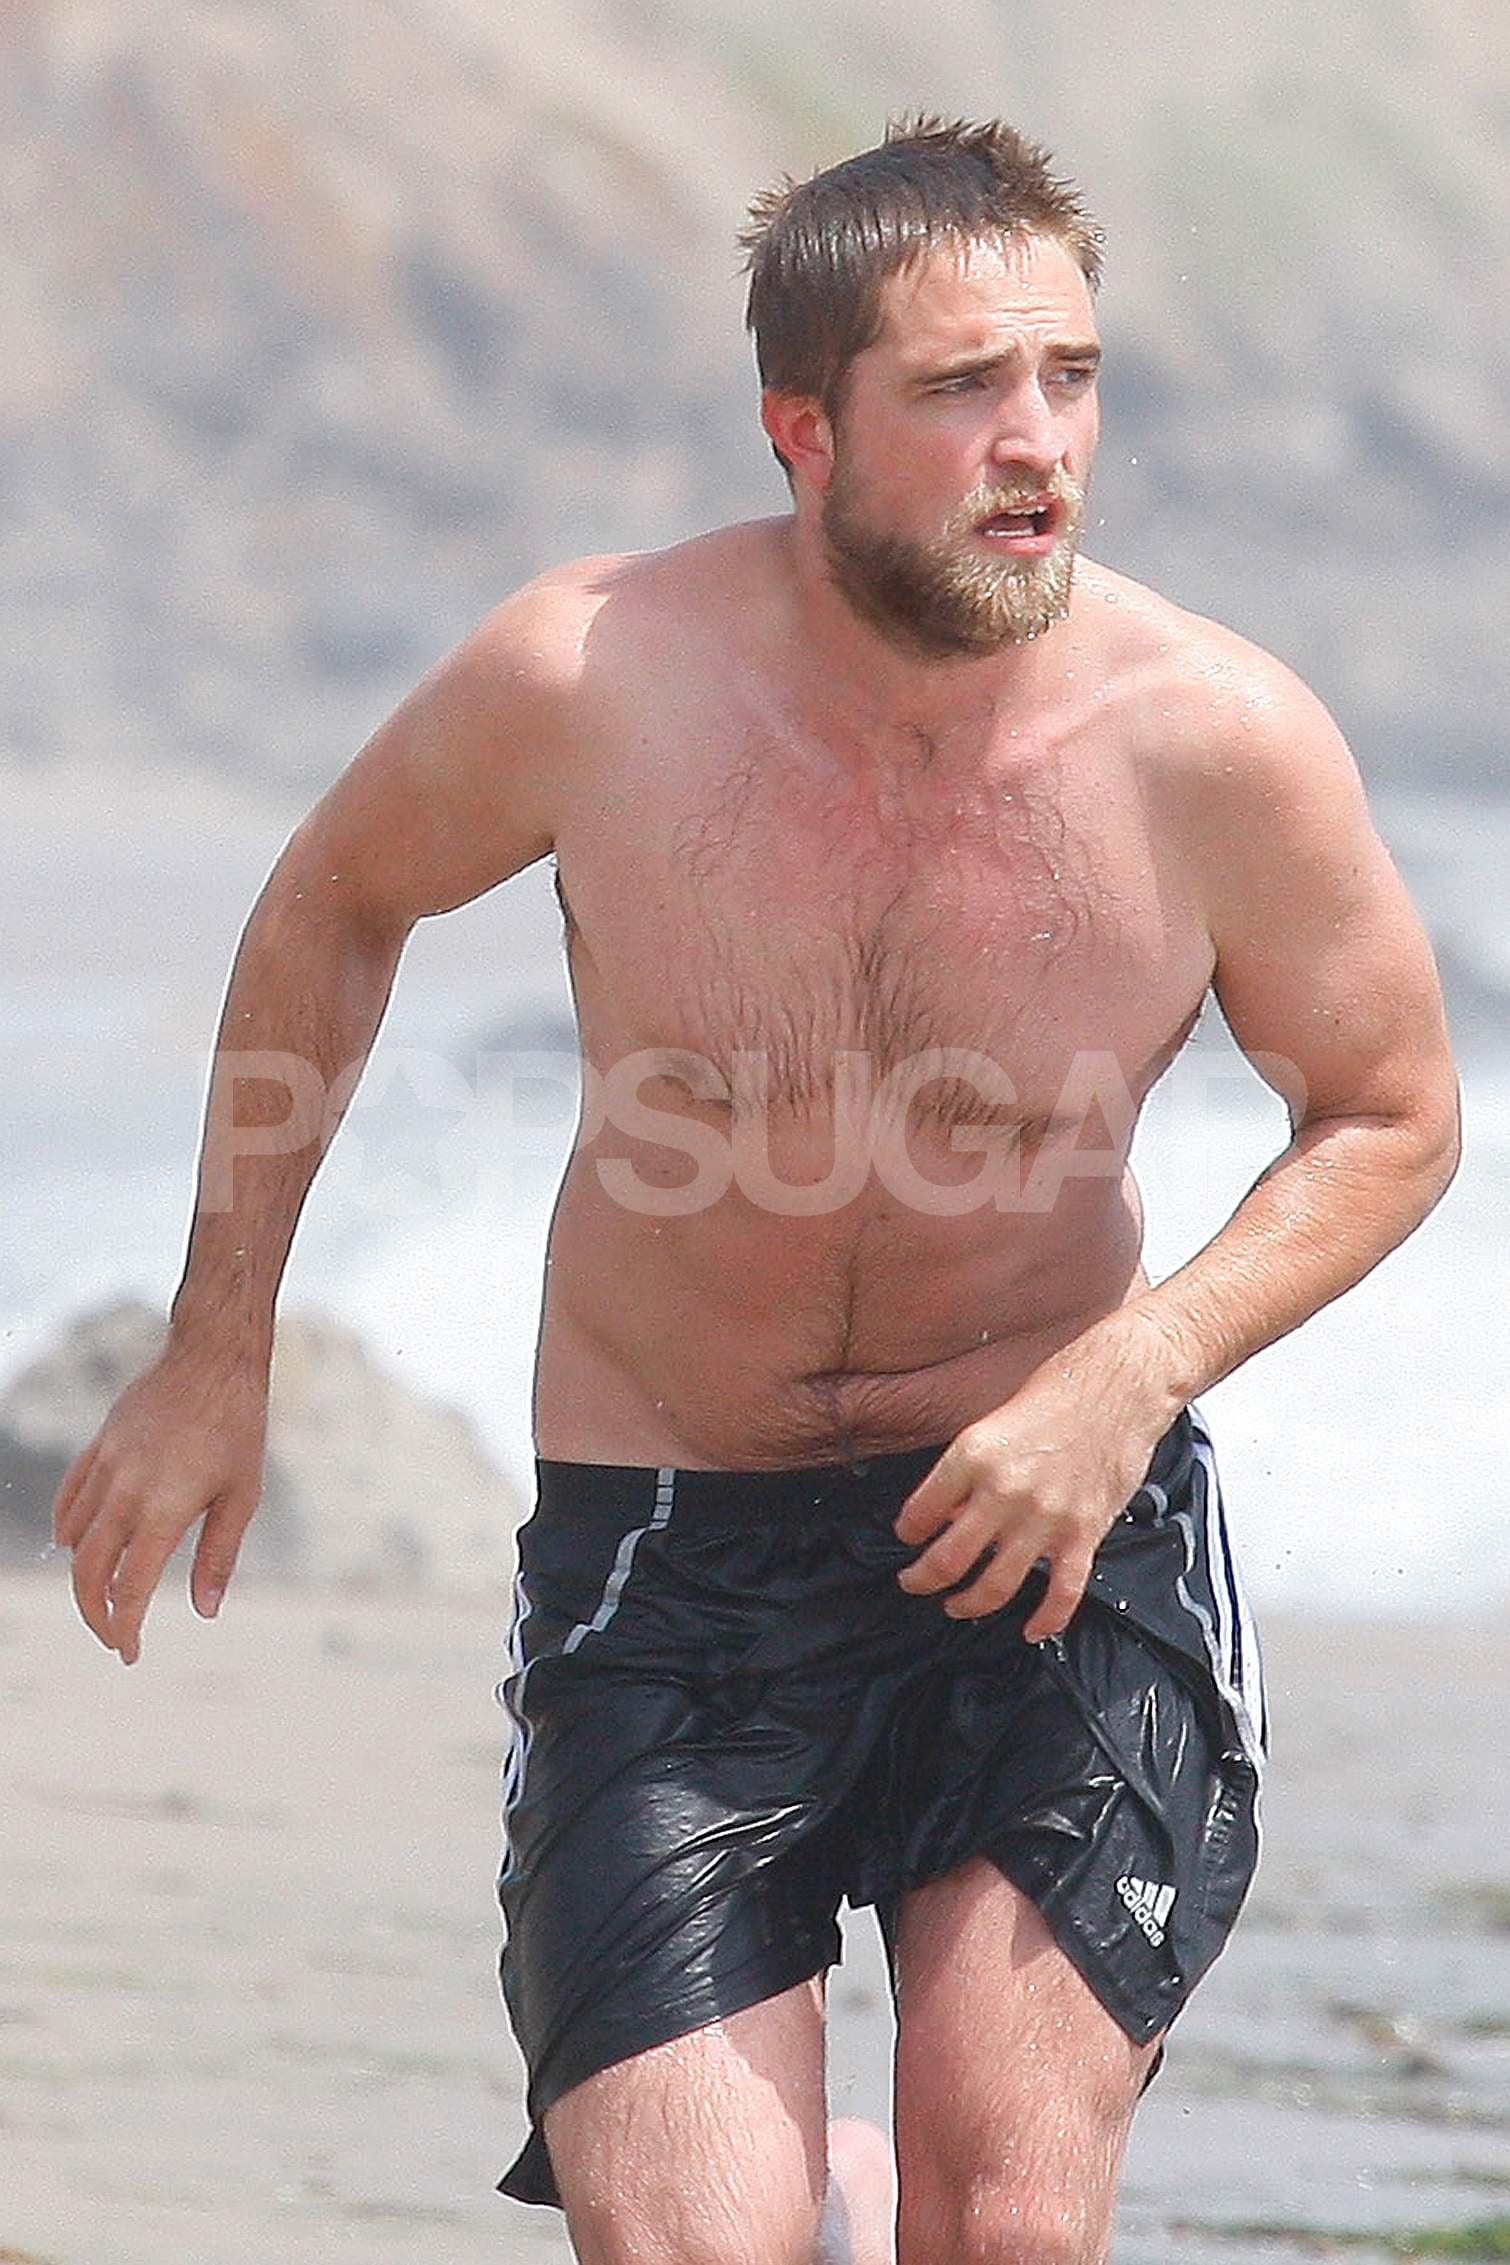 Robert pattinson body 2012